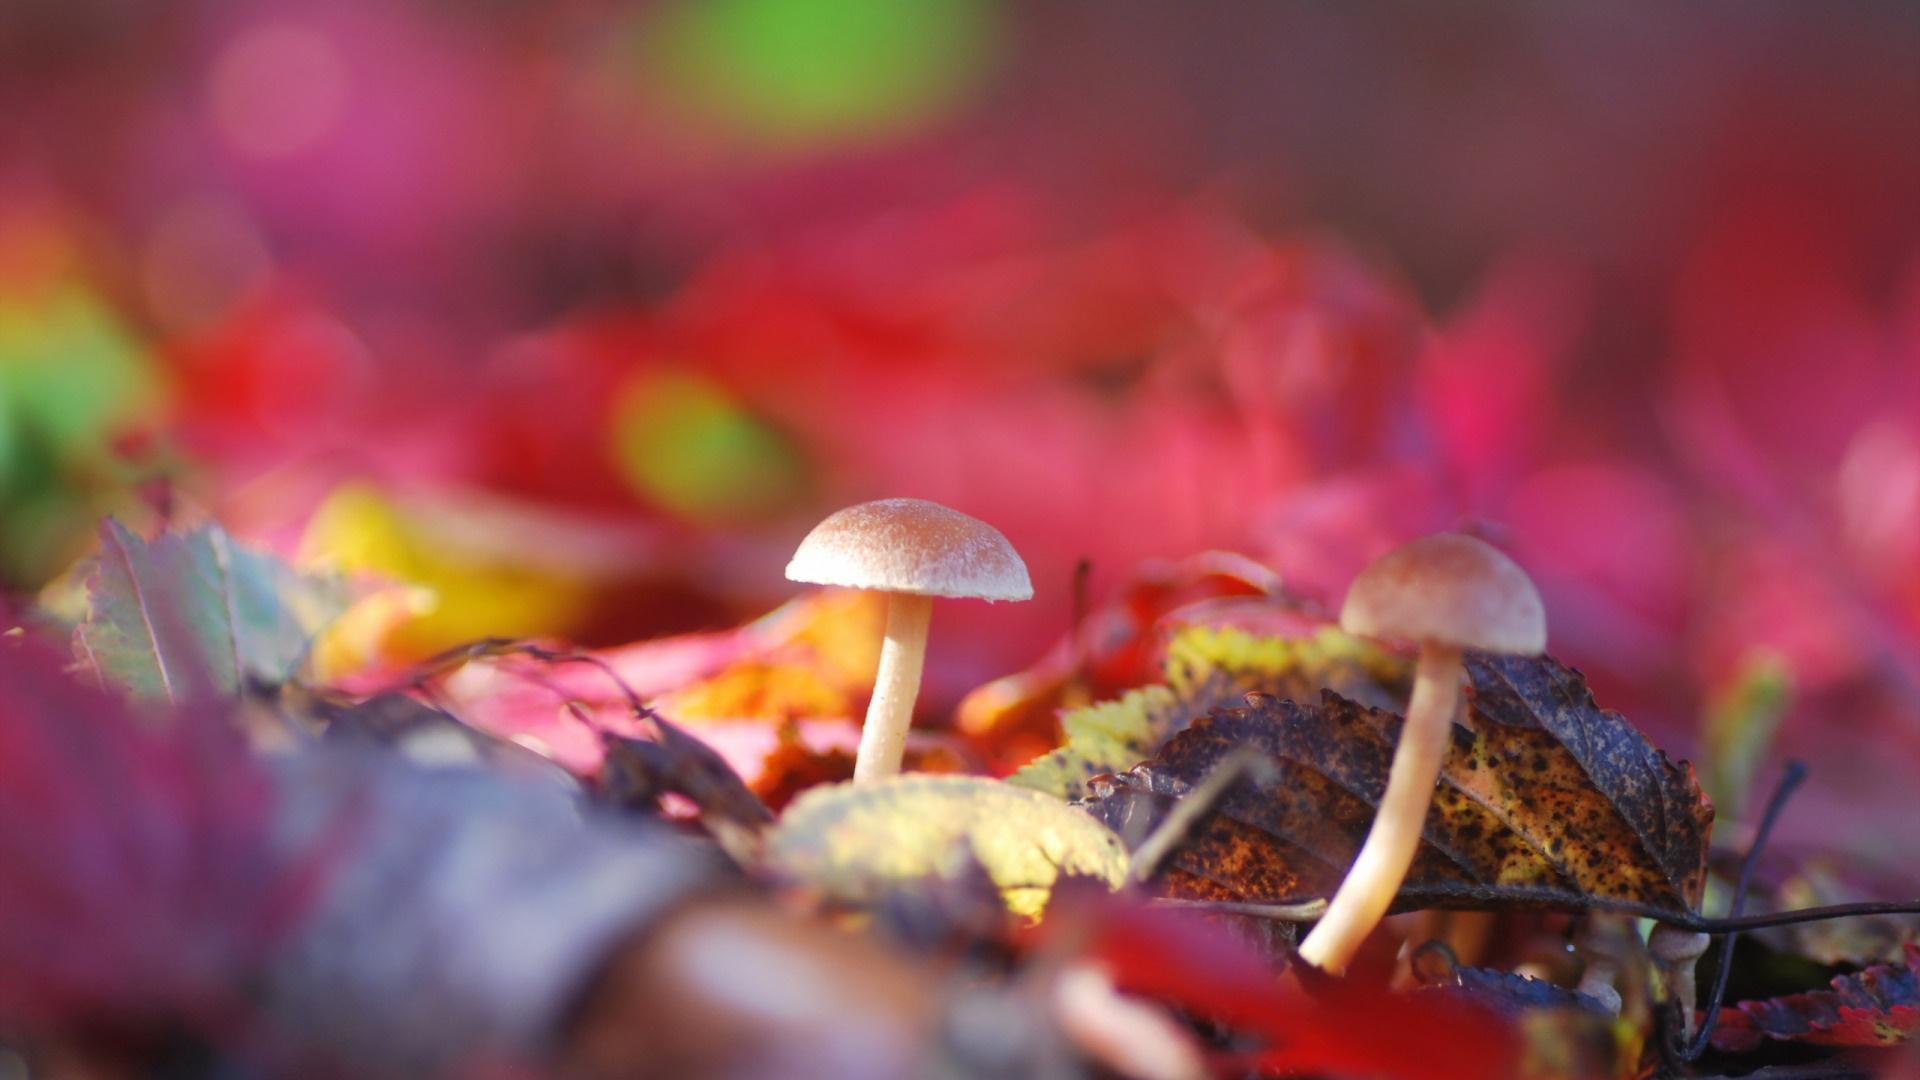 Macro Mushrooms background picture